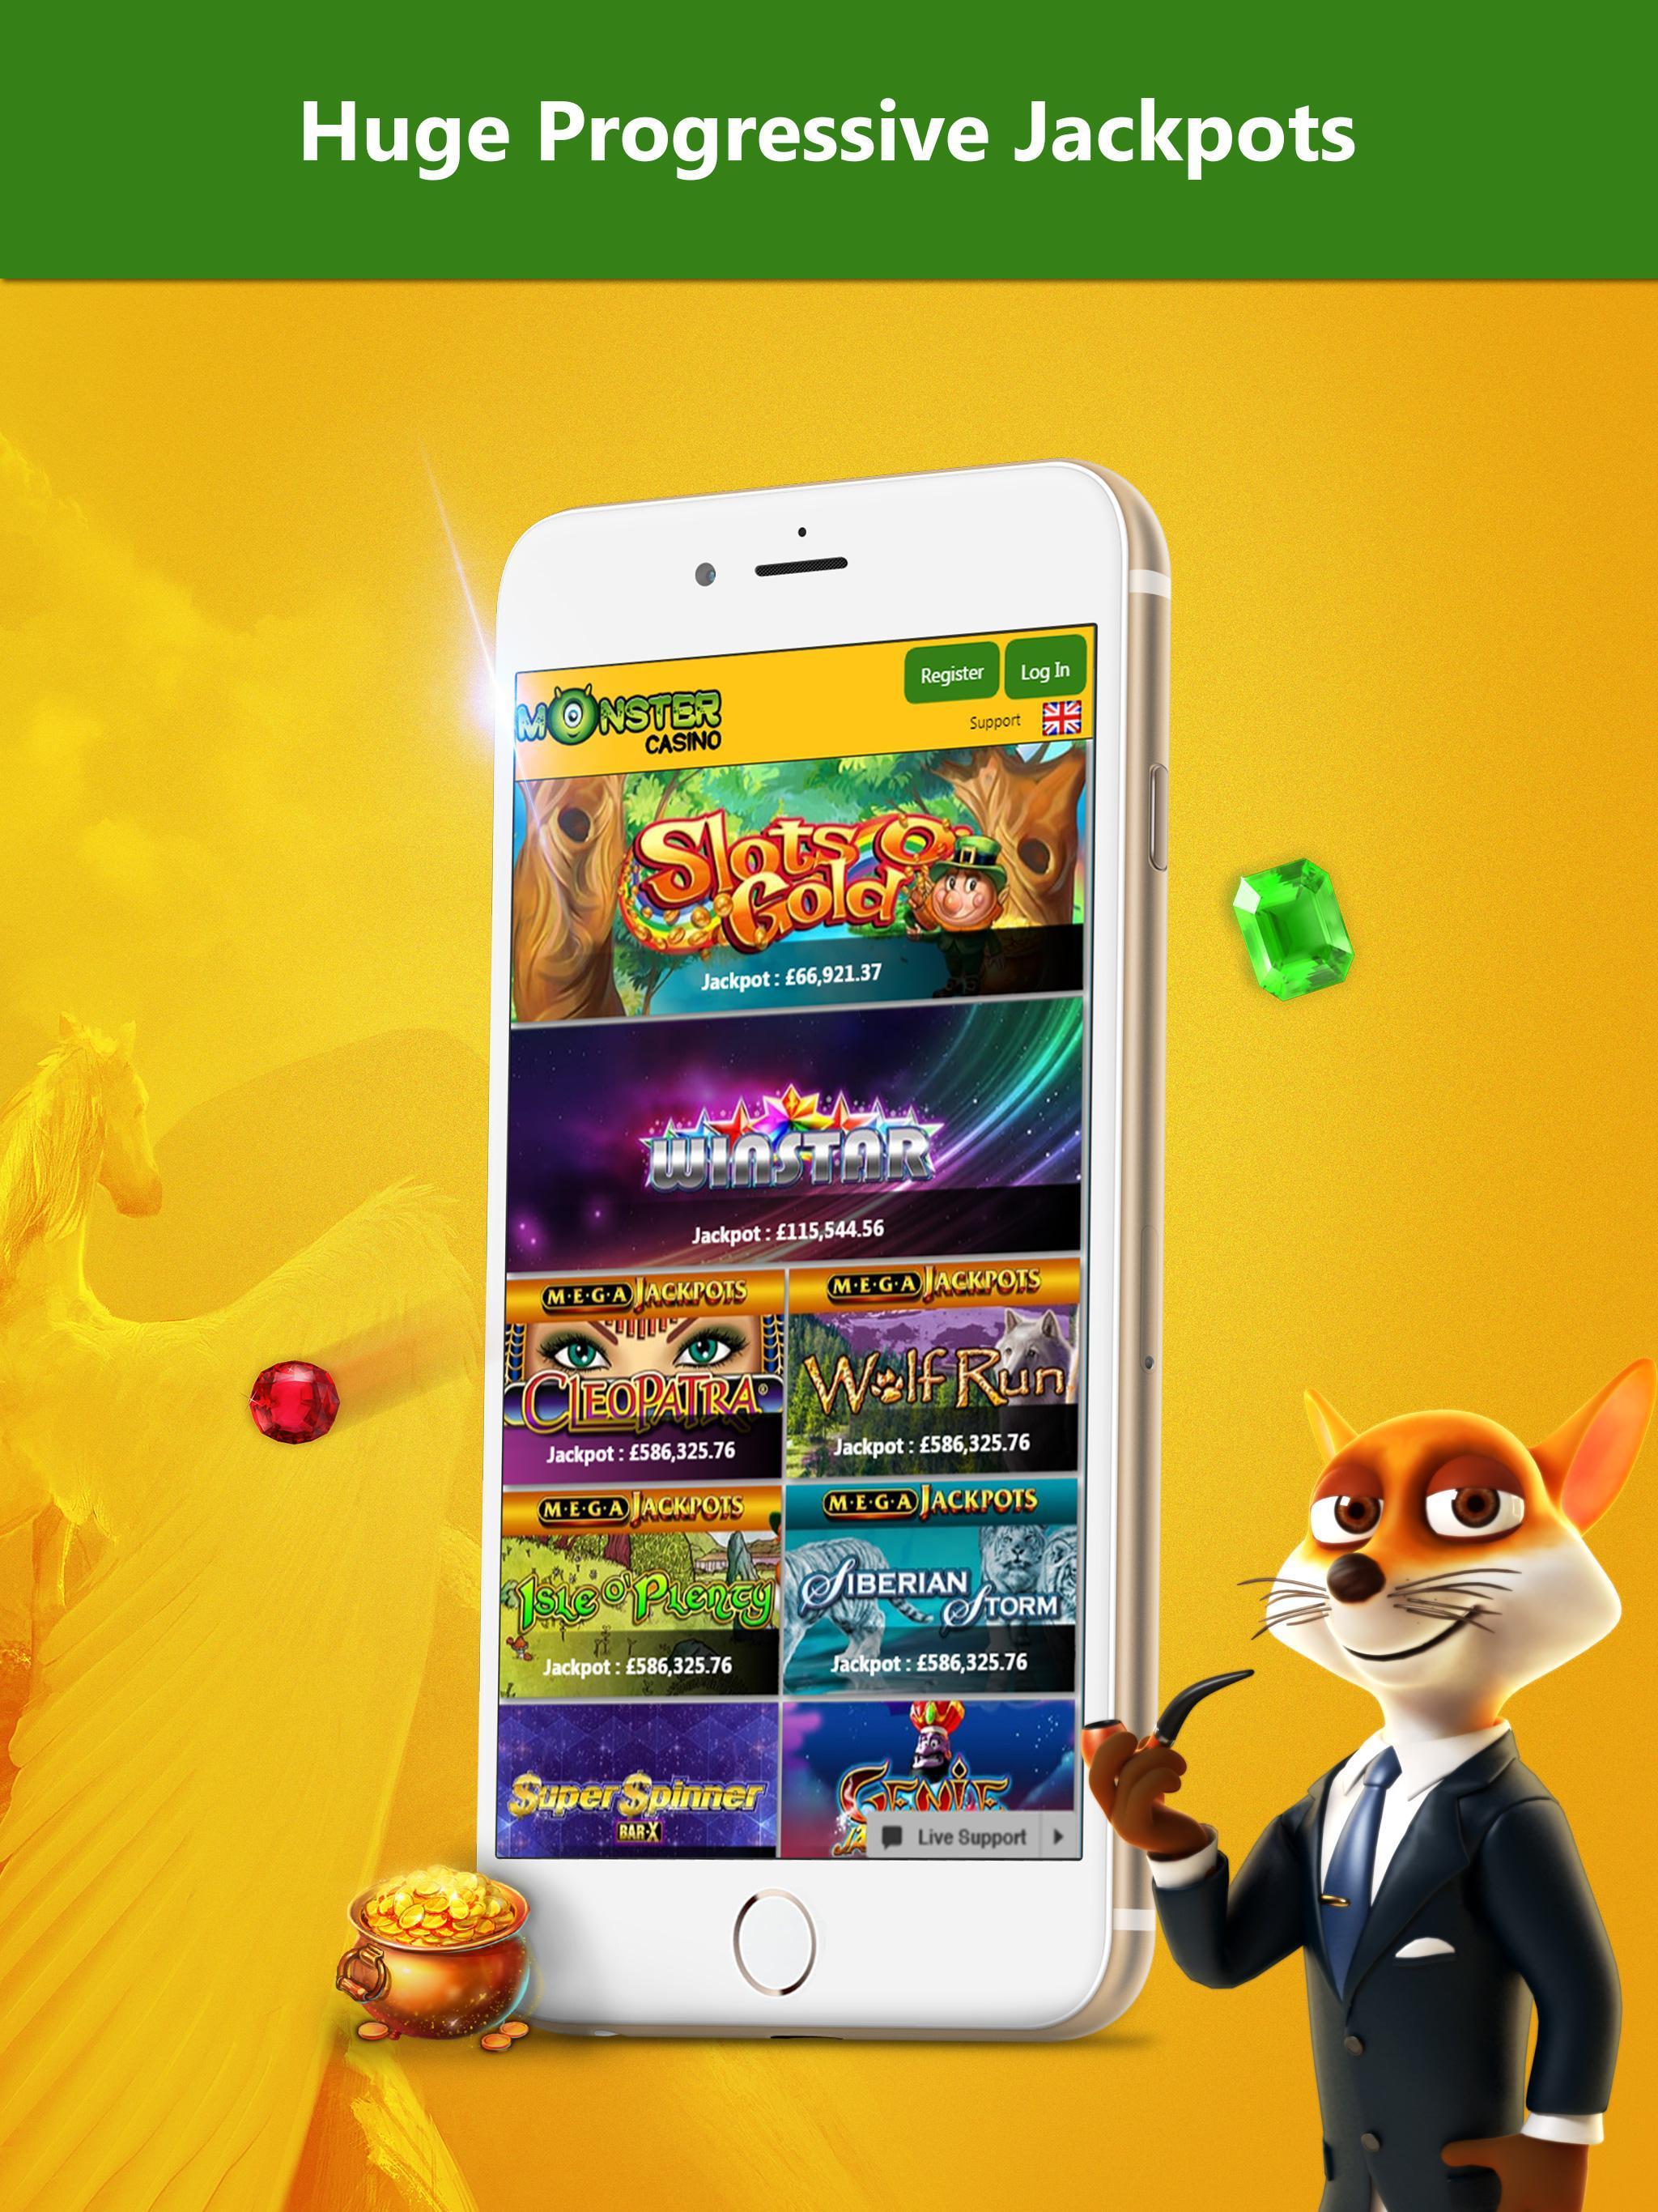 Monster Casino Real Money Mobile Casino App Uk For Android Apk